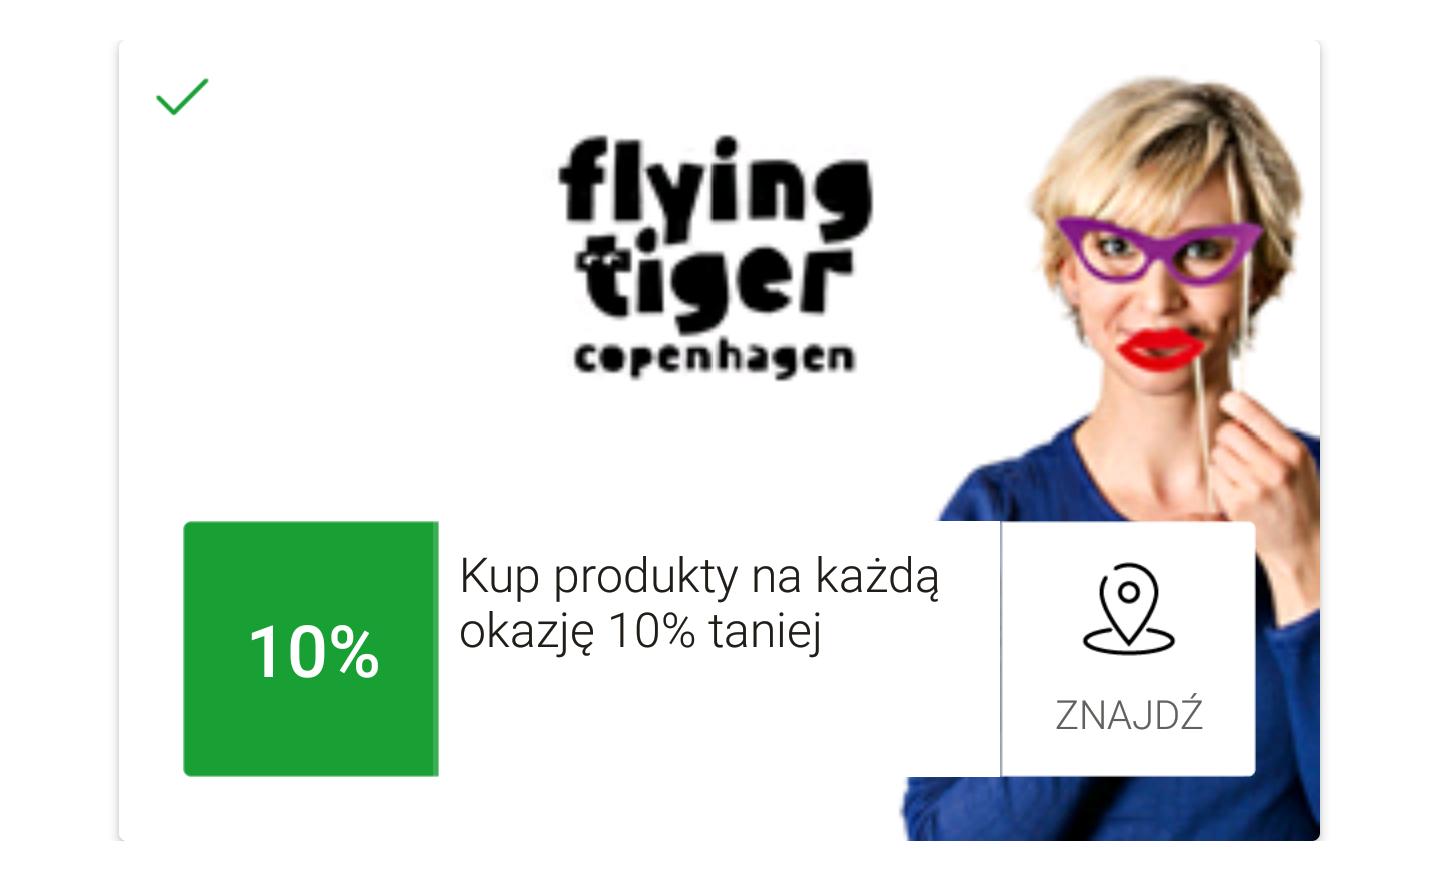 mOkazje Flying Tiger Copenhagen 10% x3